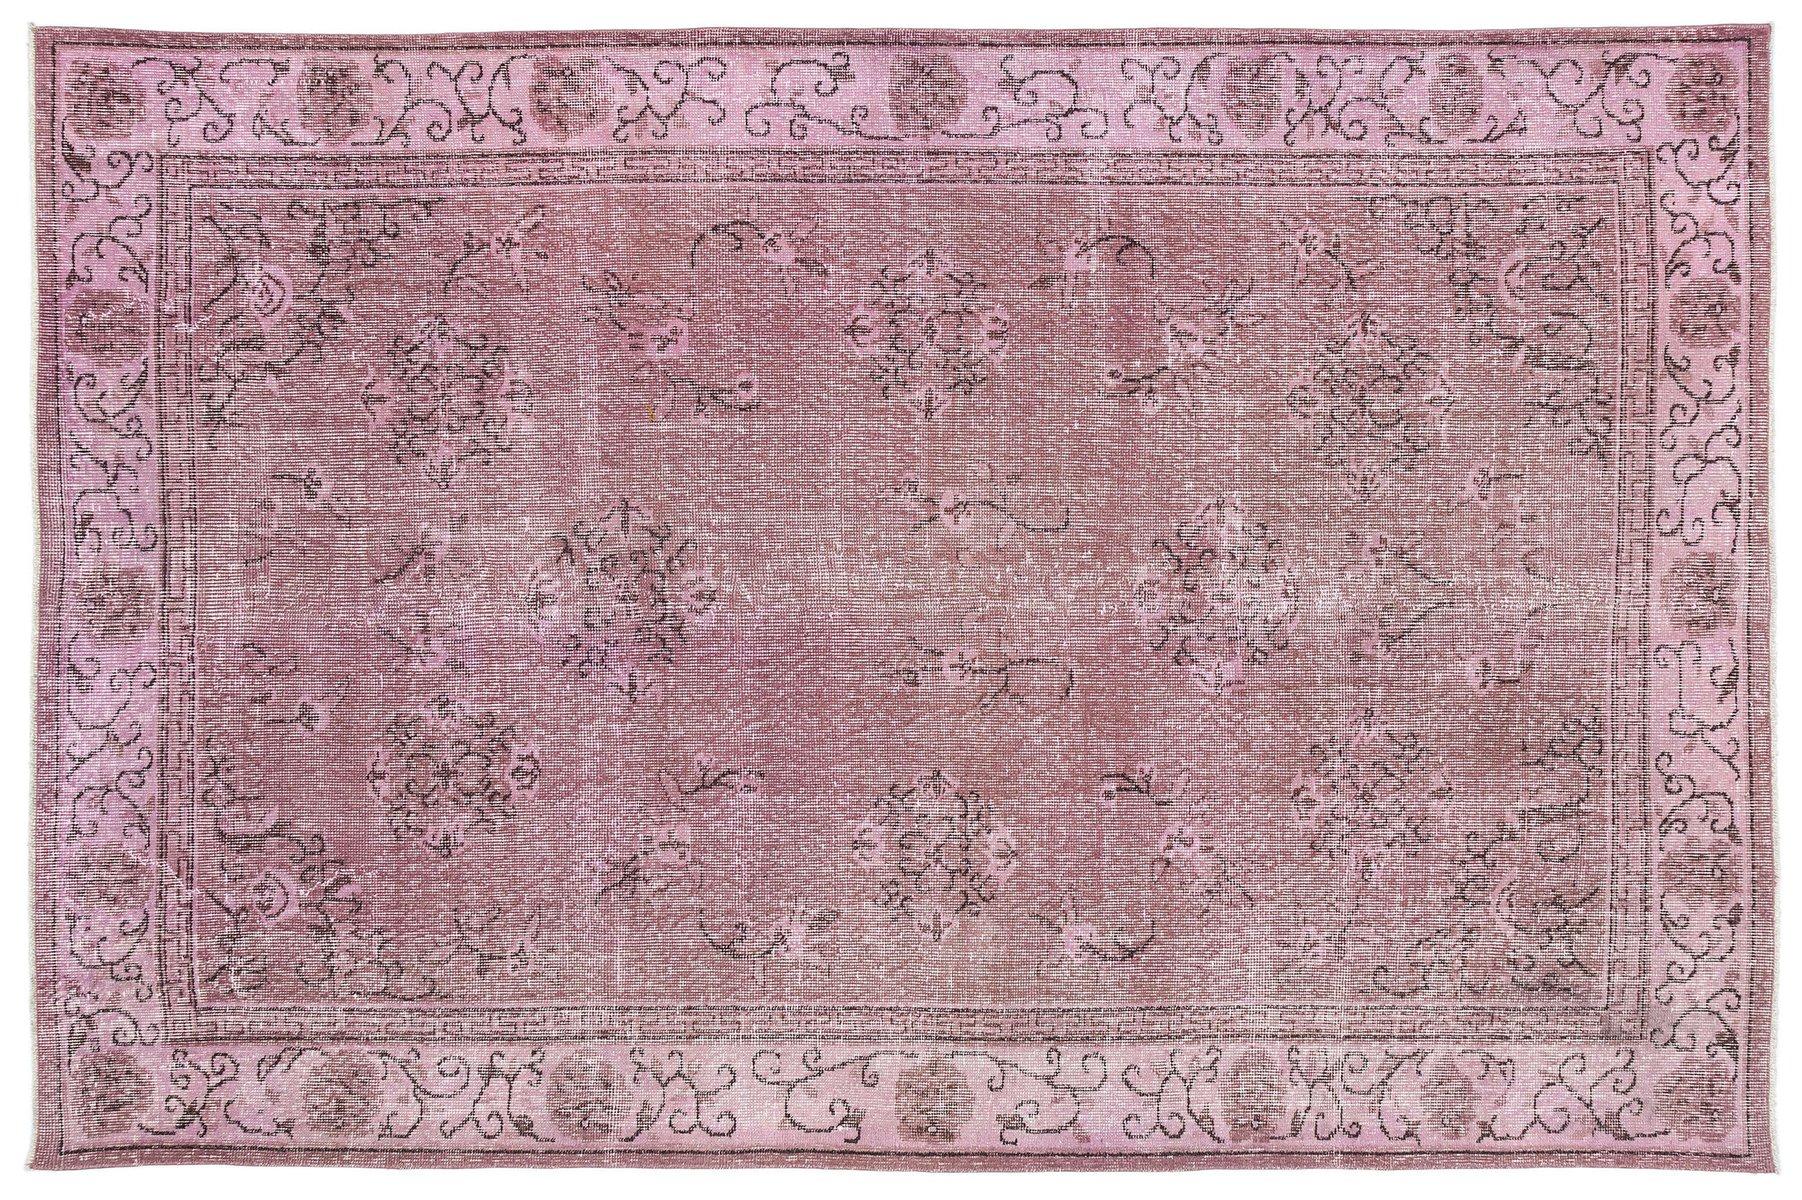 Vintage Turkish Pink Overdyed Rug For Sale At Pamono